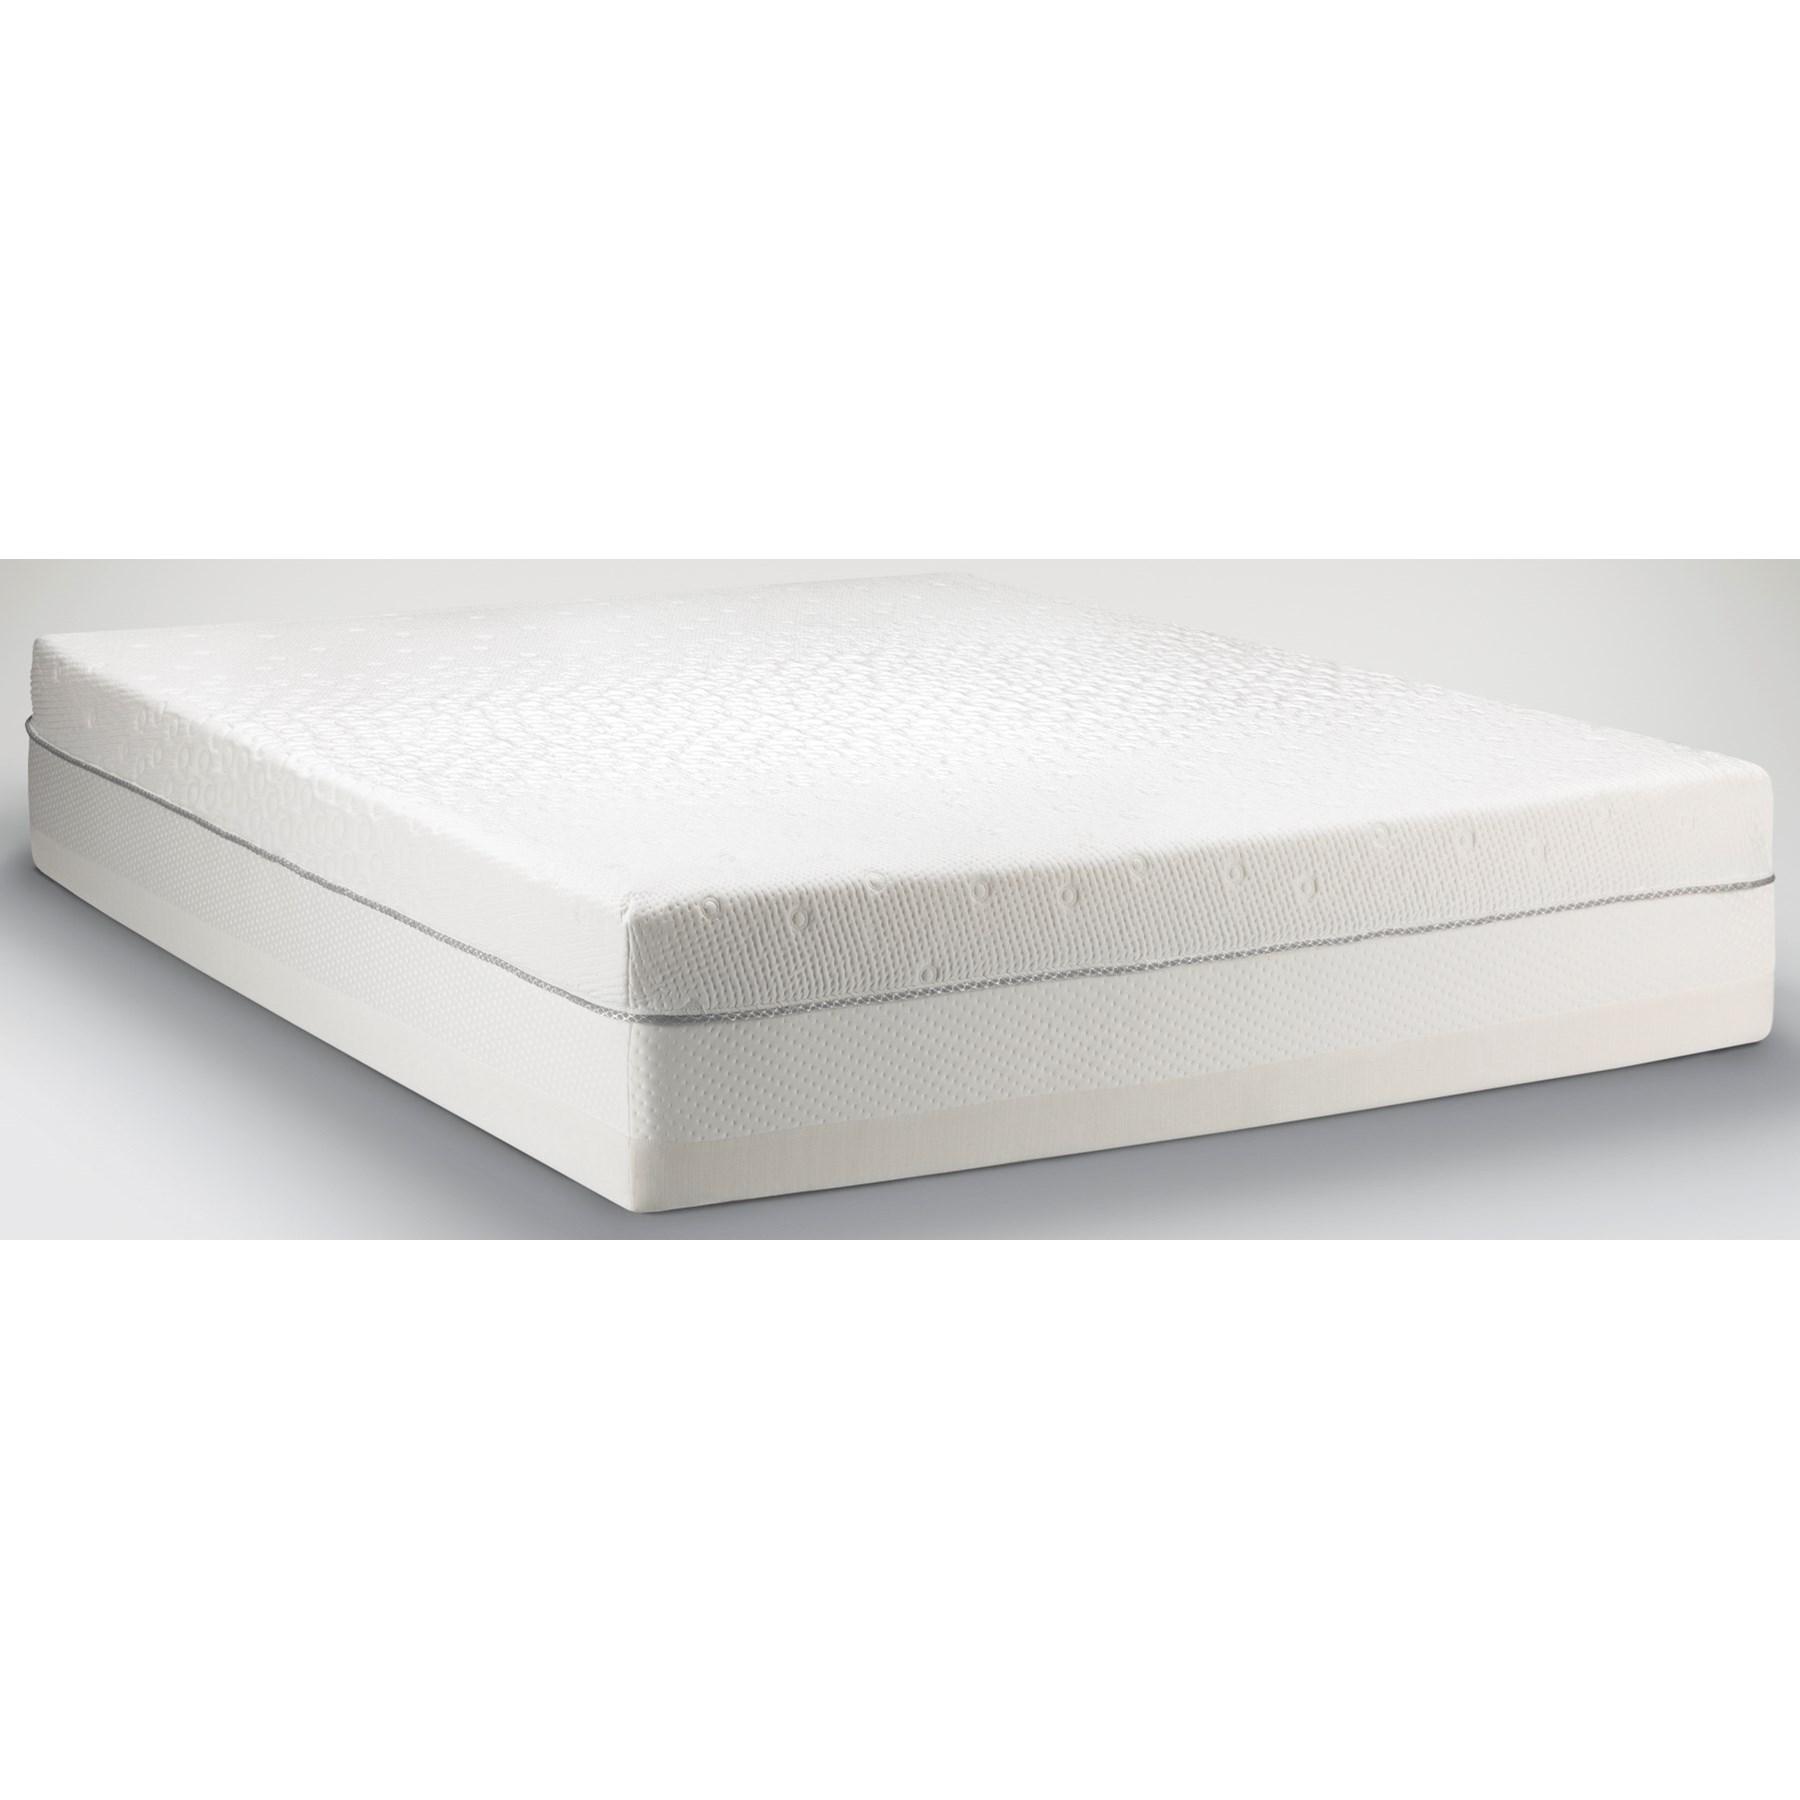 Tempur-Pedic®  TEMPUR-Choice™  Supreme Queen Firm to Medium Soft Mattress  - Item Number: 10111150